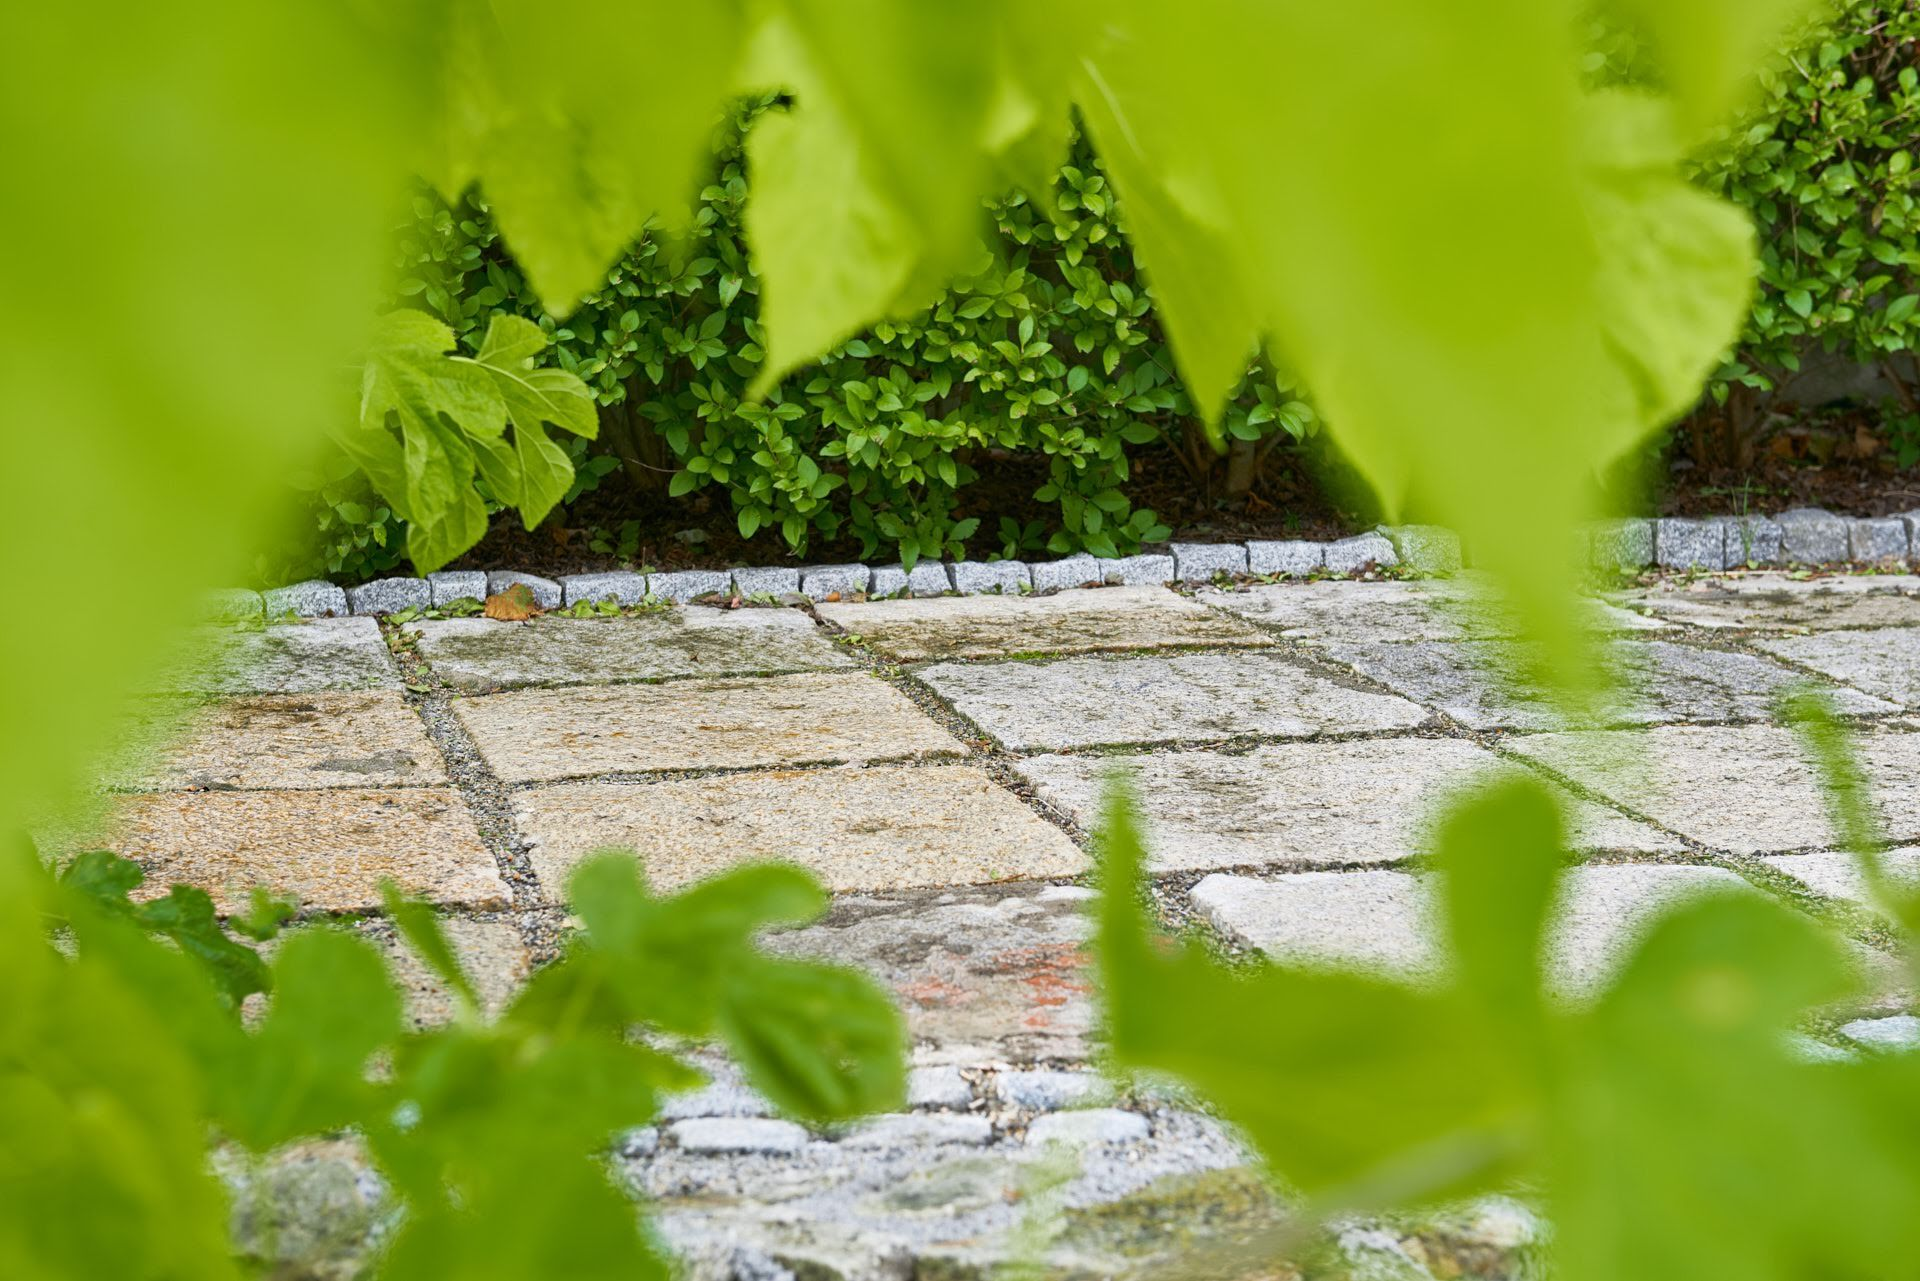 Granit-Naturstein-stone4you-08